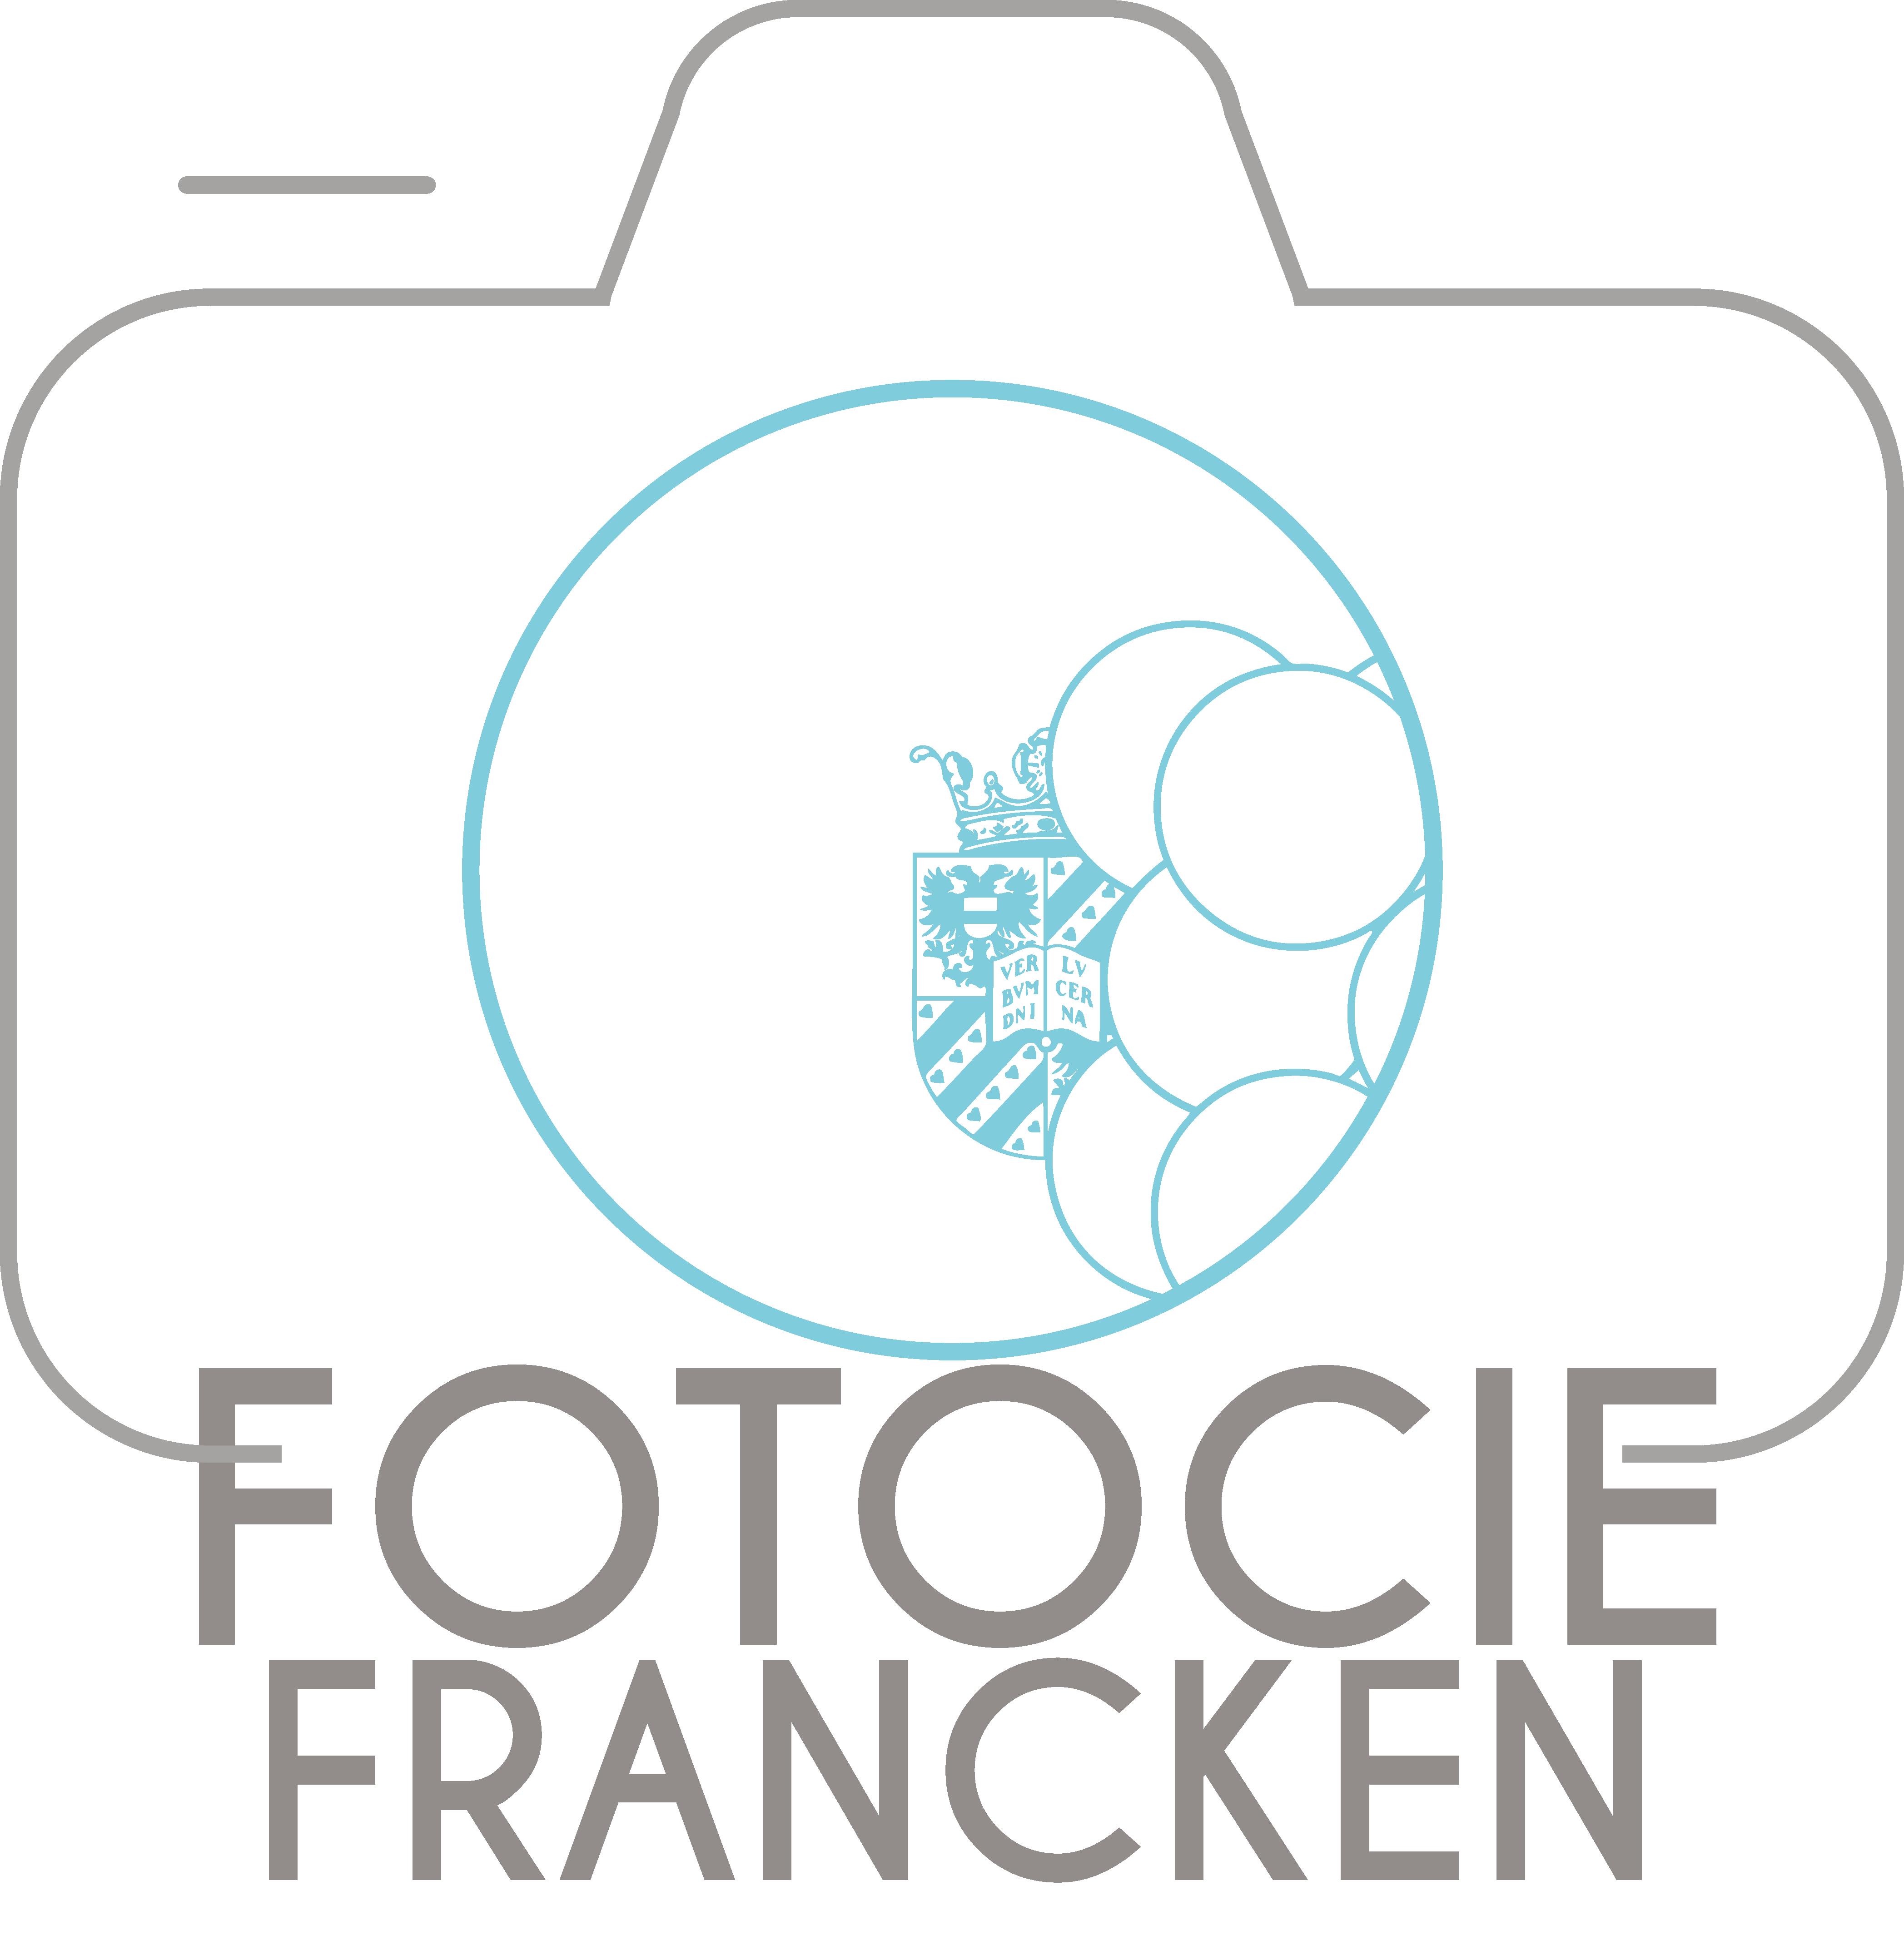 Fotocie's logo